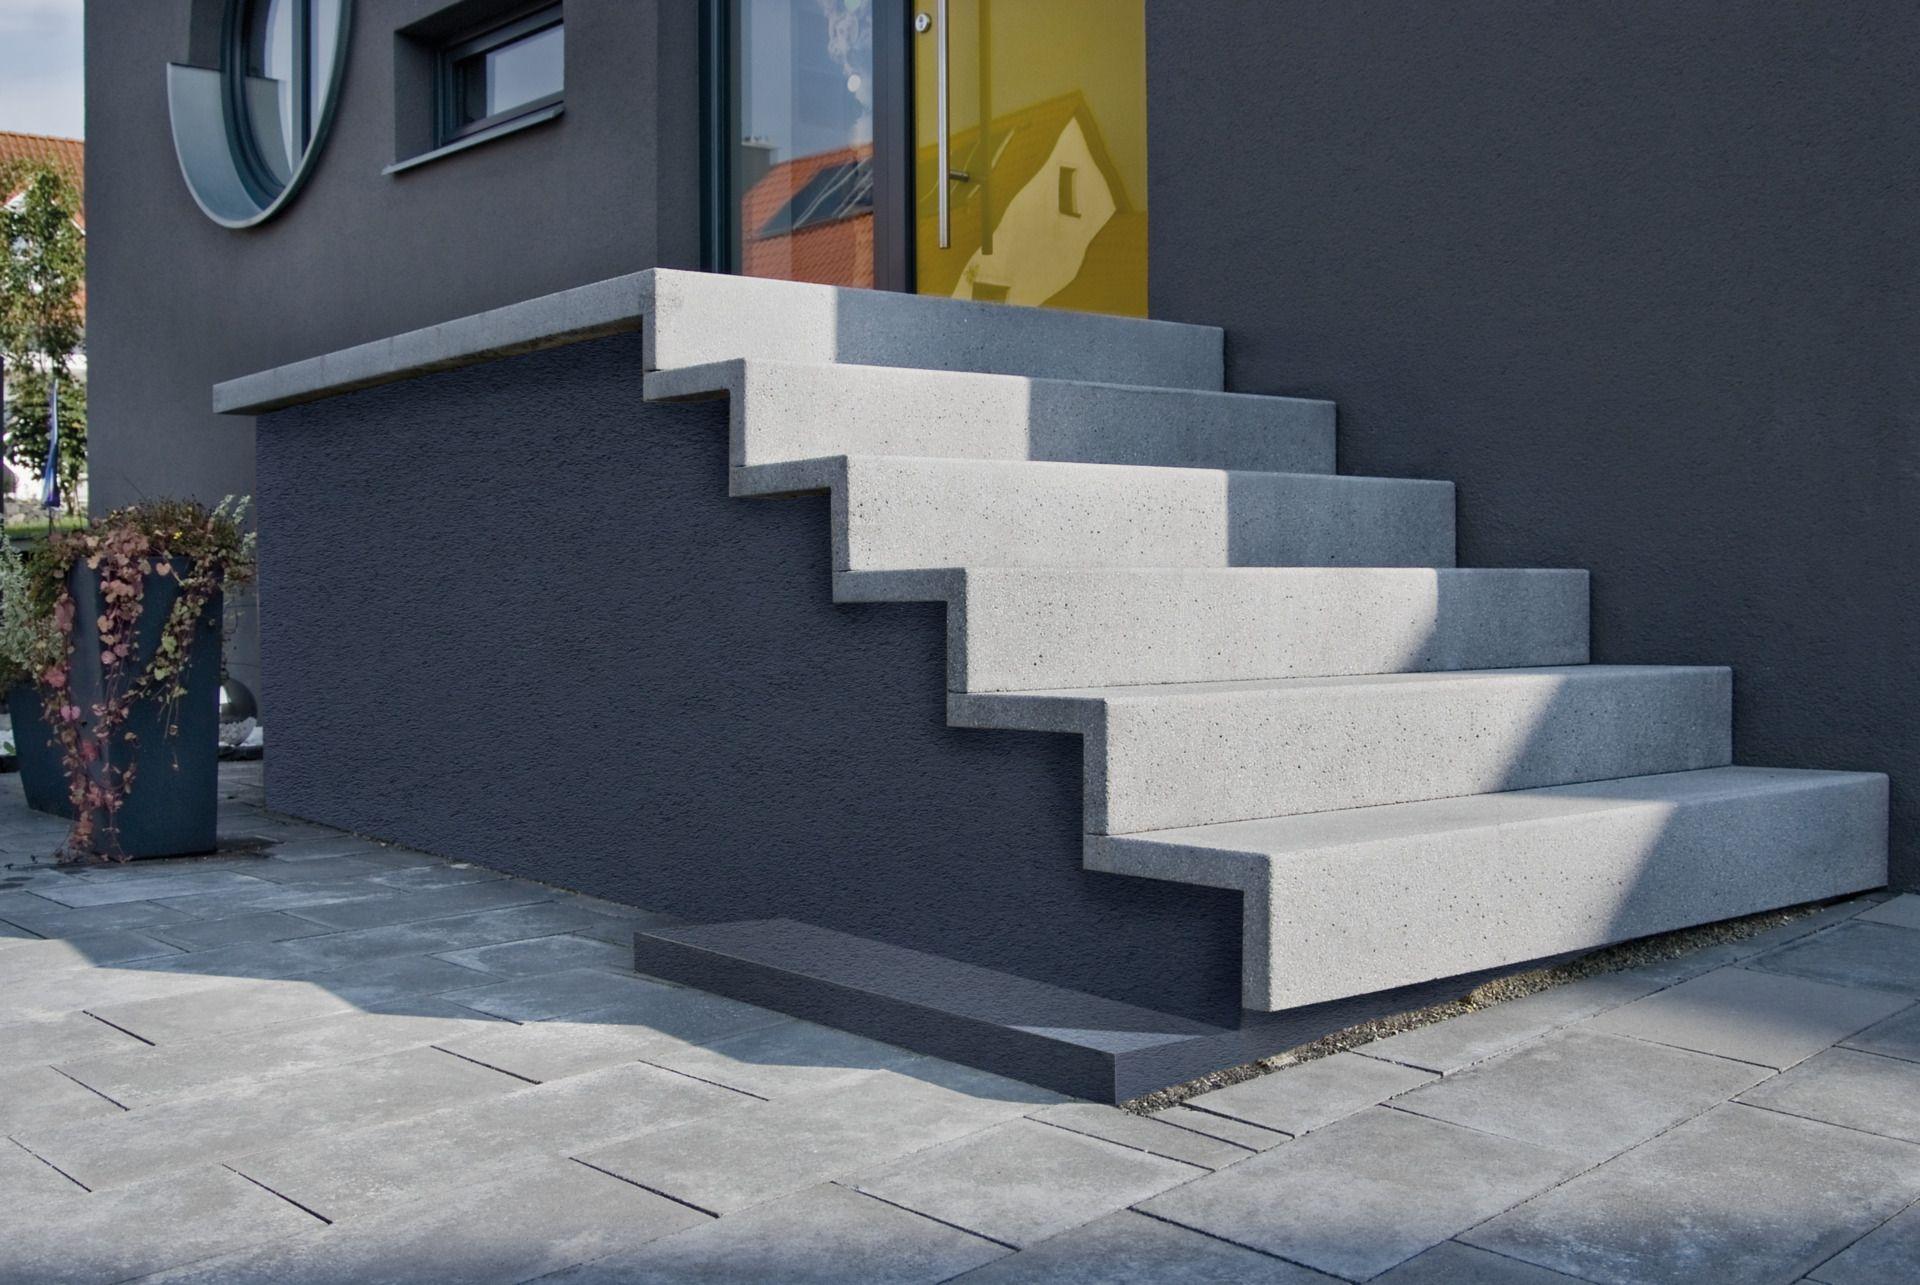 Treppen Und Stufenideen Hauseingang Treppen Eingang Treppe Treppe